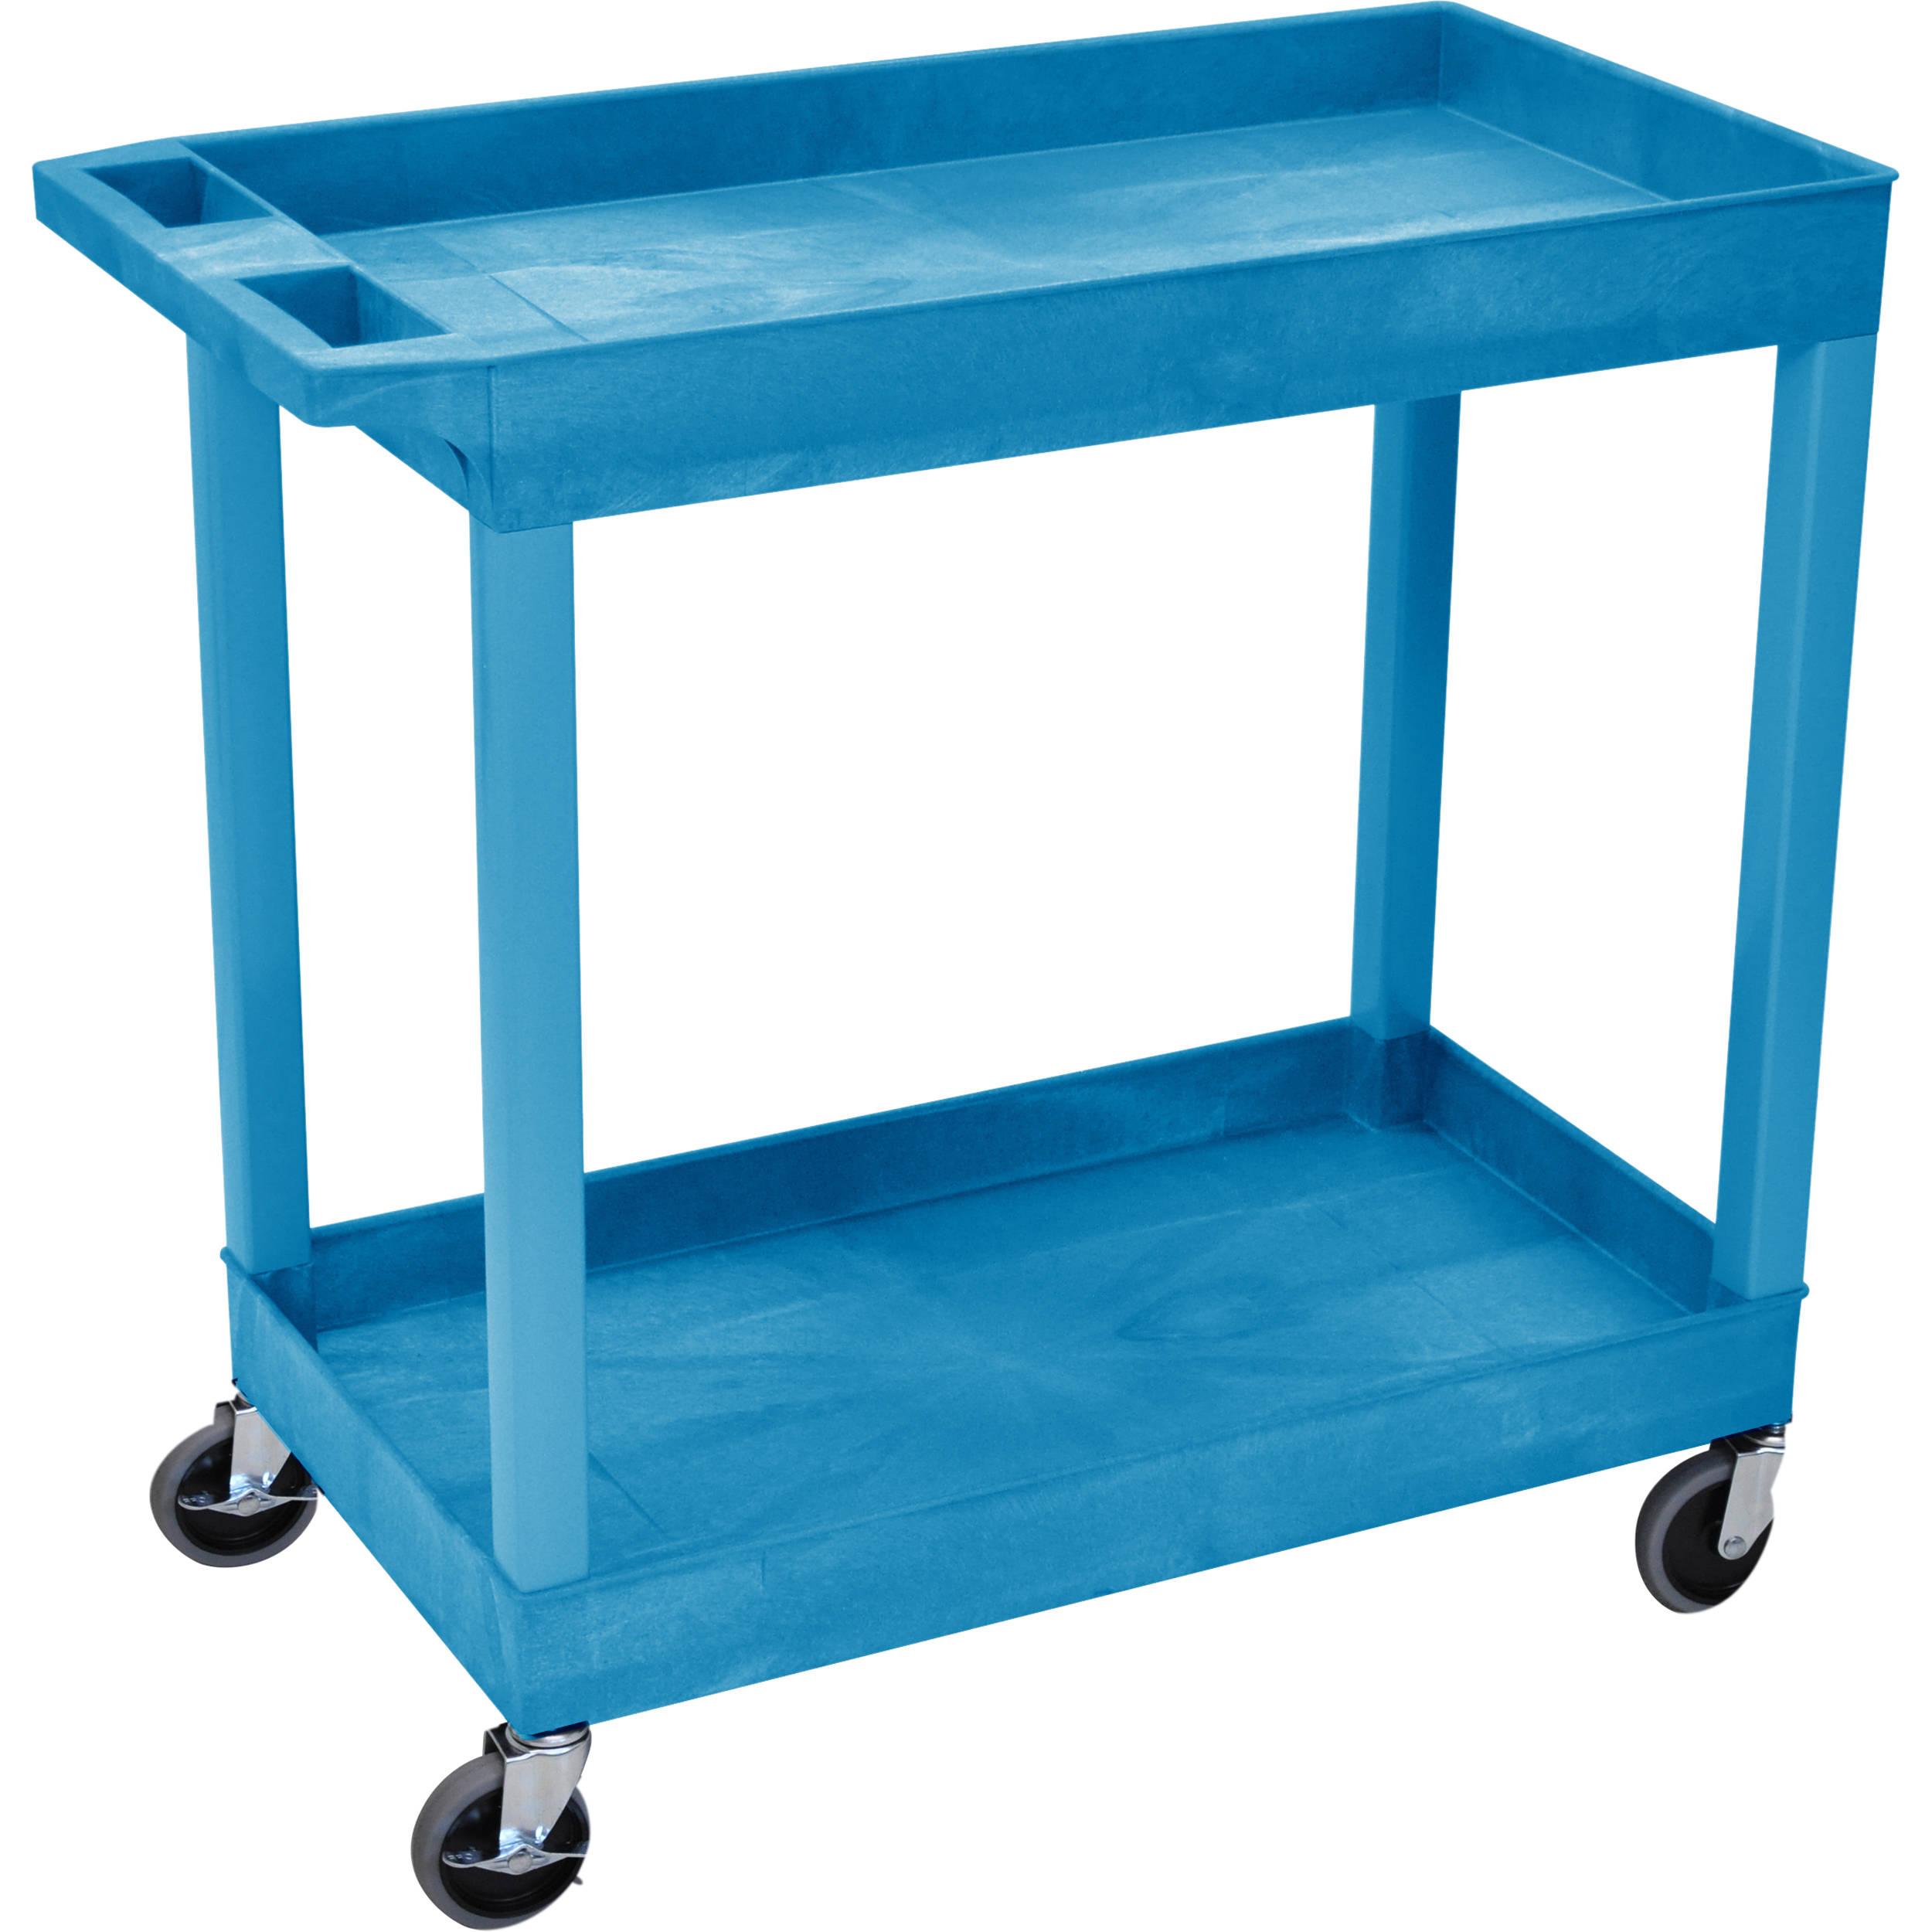 luxor rolling tub cart 2 shelves blue ec11 bu b h photo. Black Bedroom Furniture Sets. Home Design Ideas